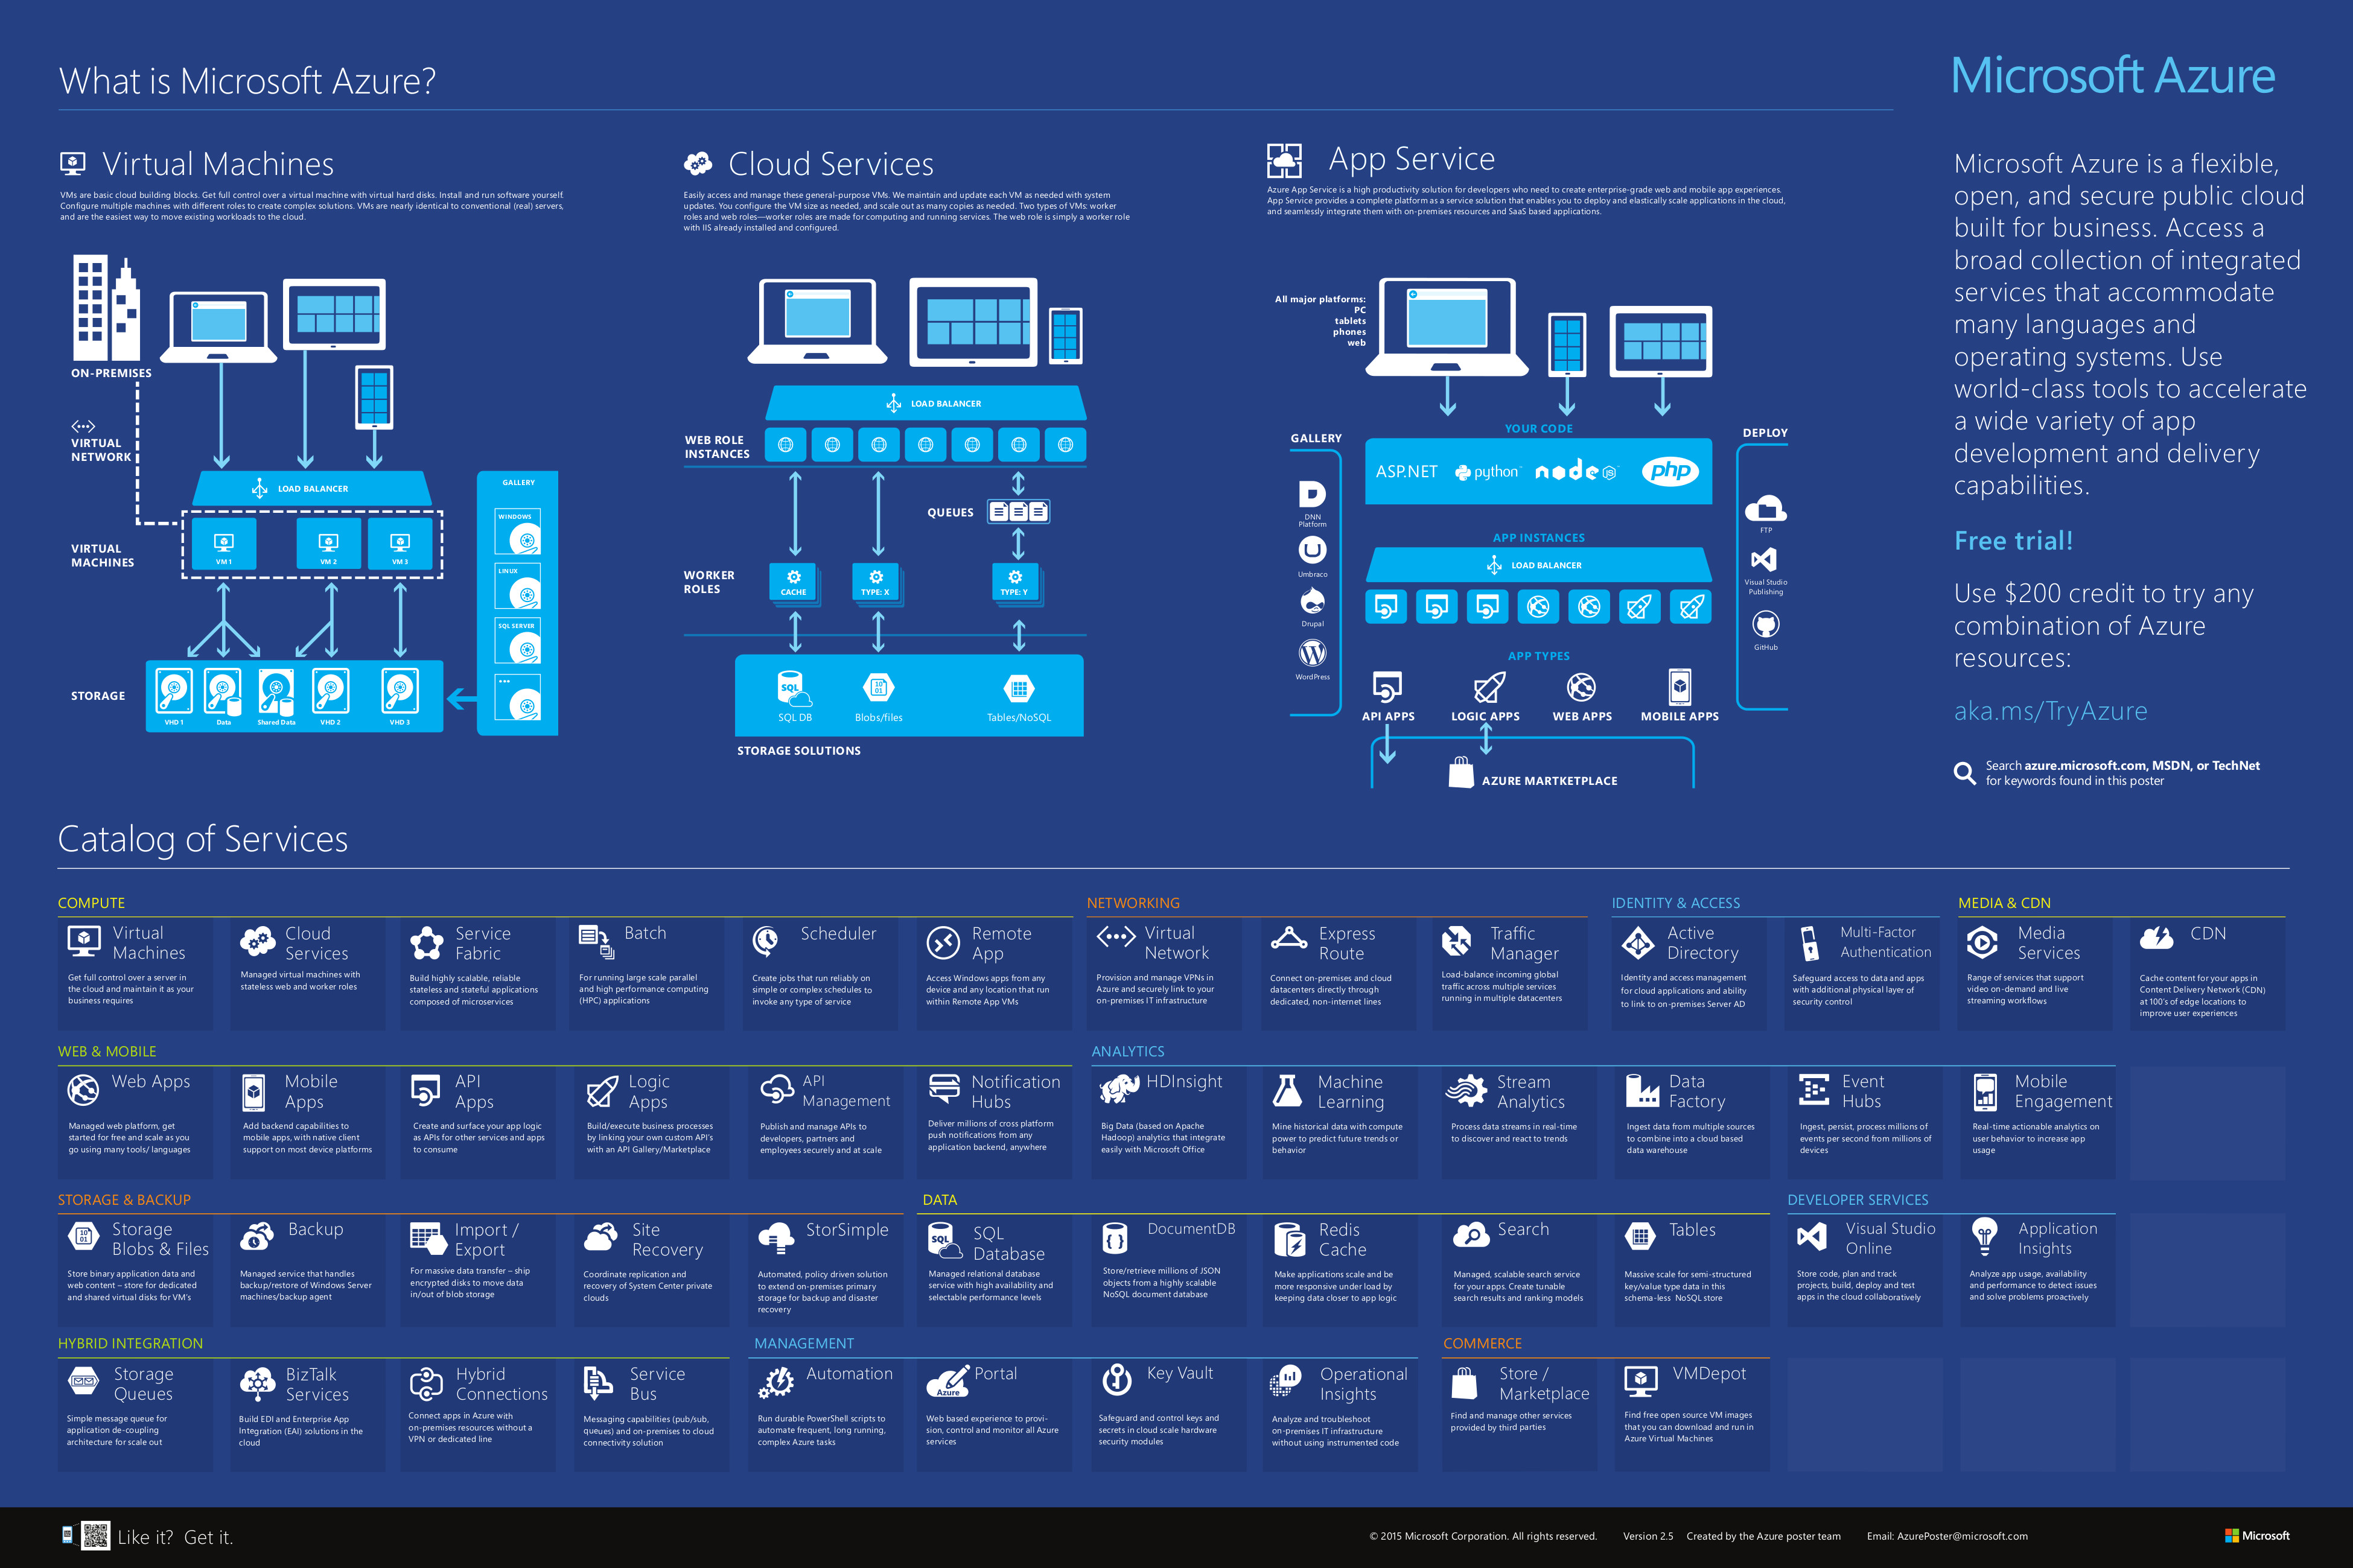 Microsoft-Azure-Infographic-2015-2.5